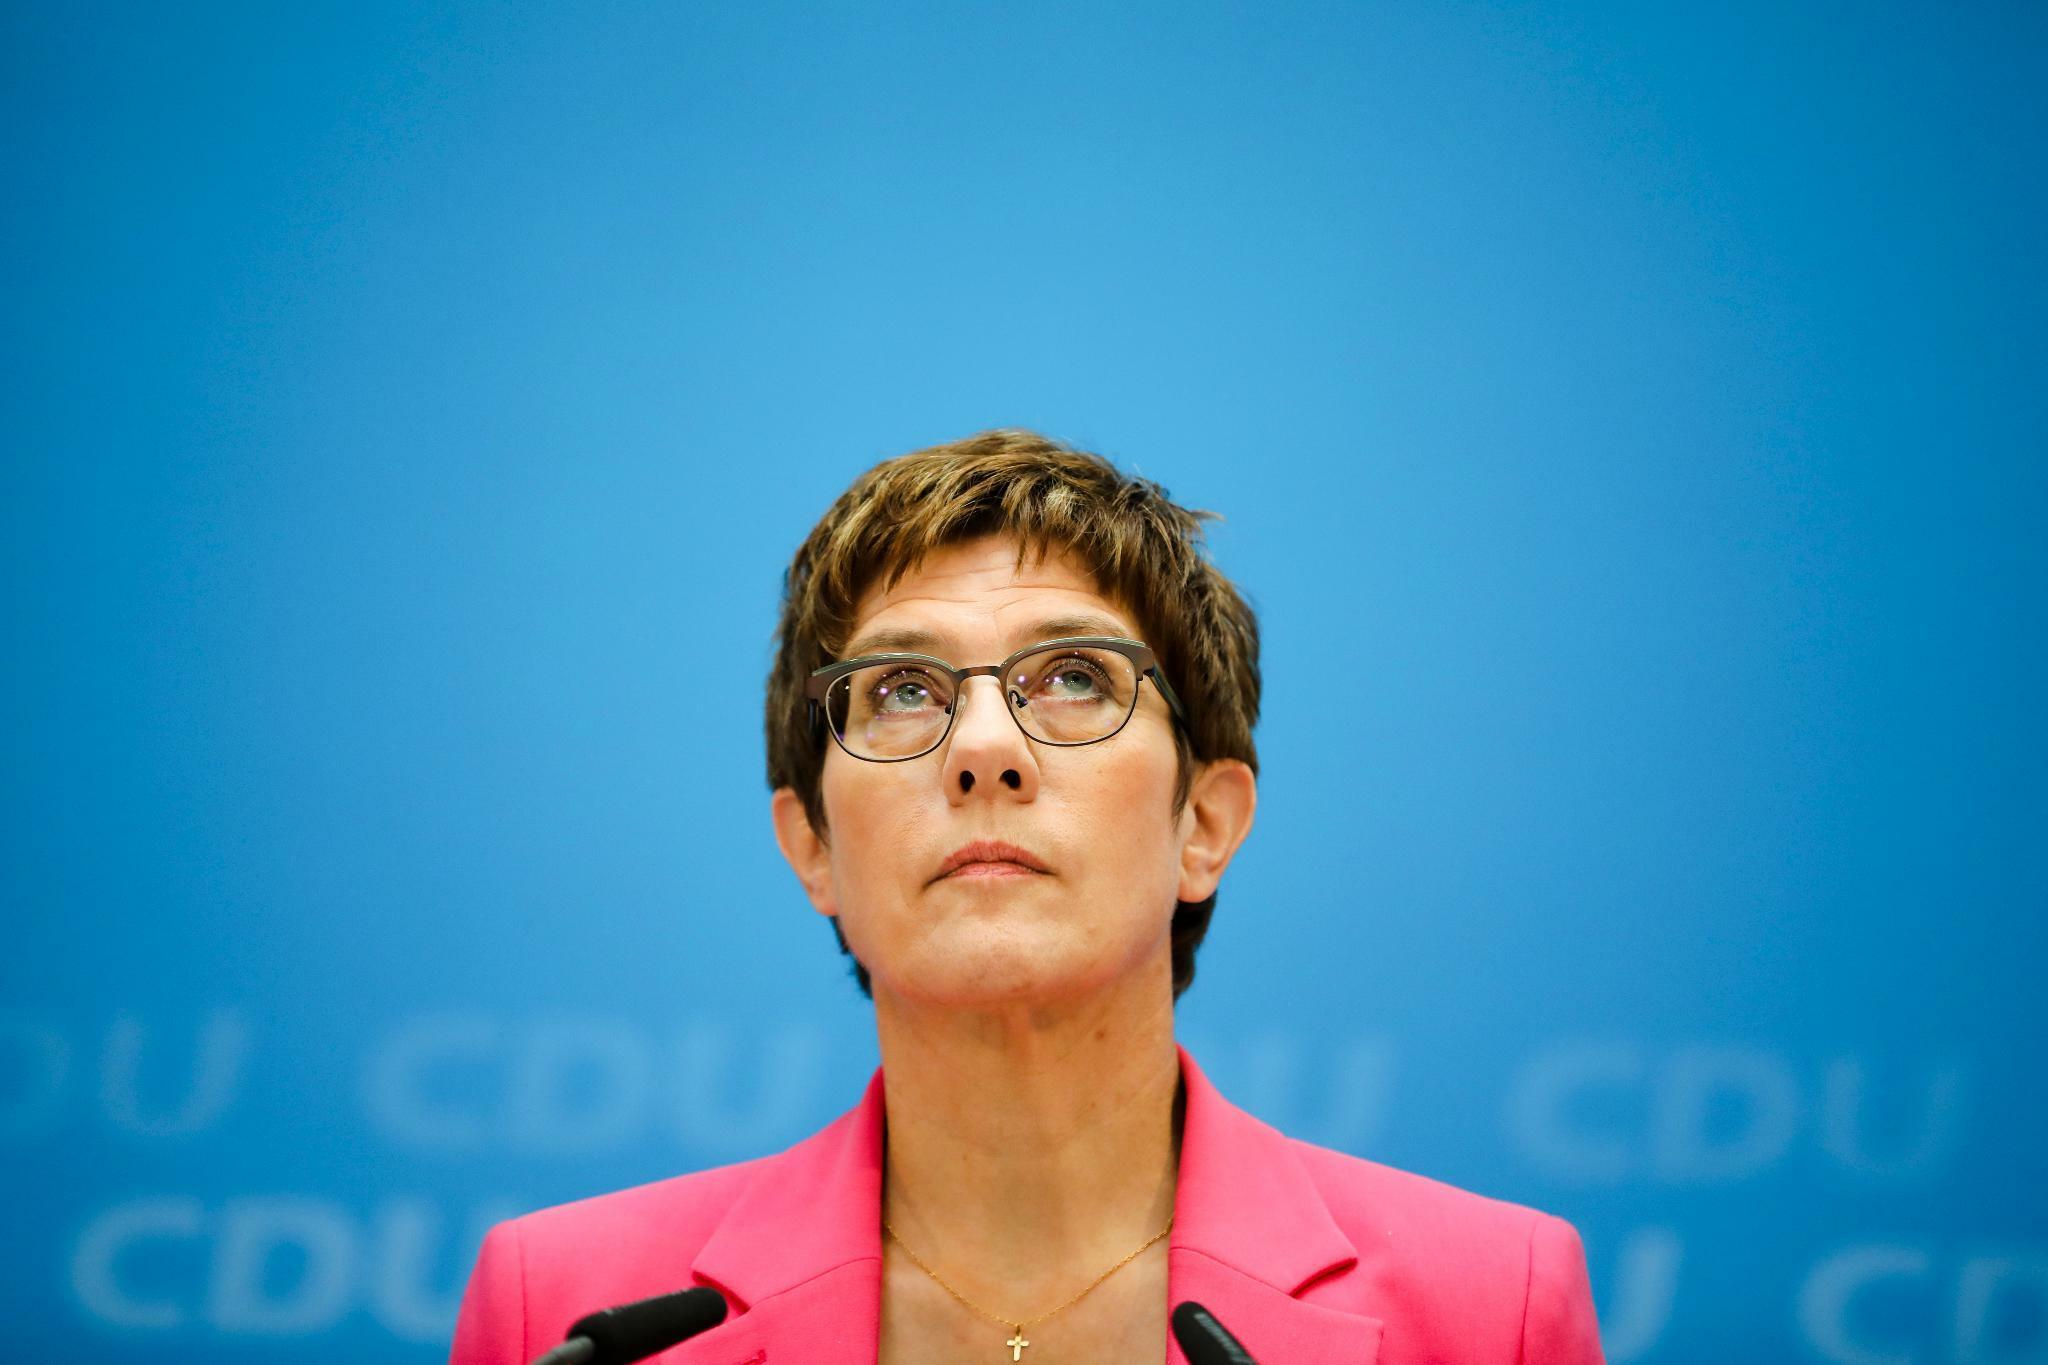 CDU streitet erneut über Umgang mit der AfD